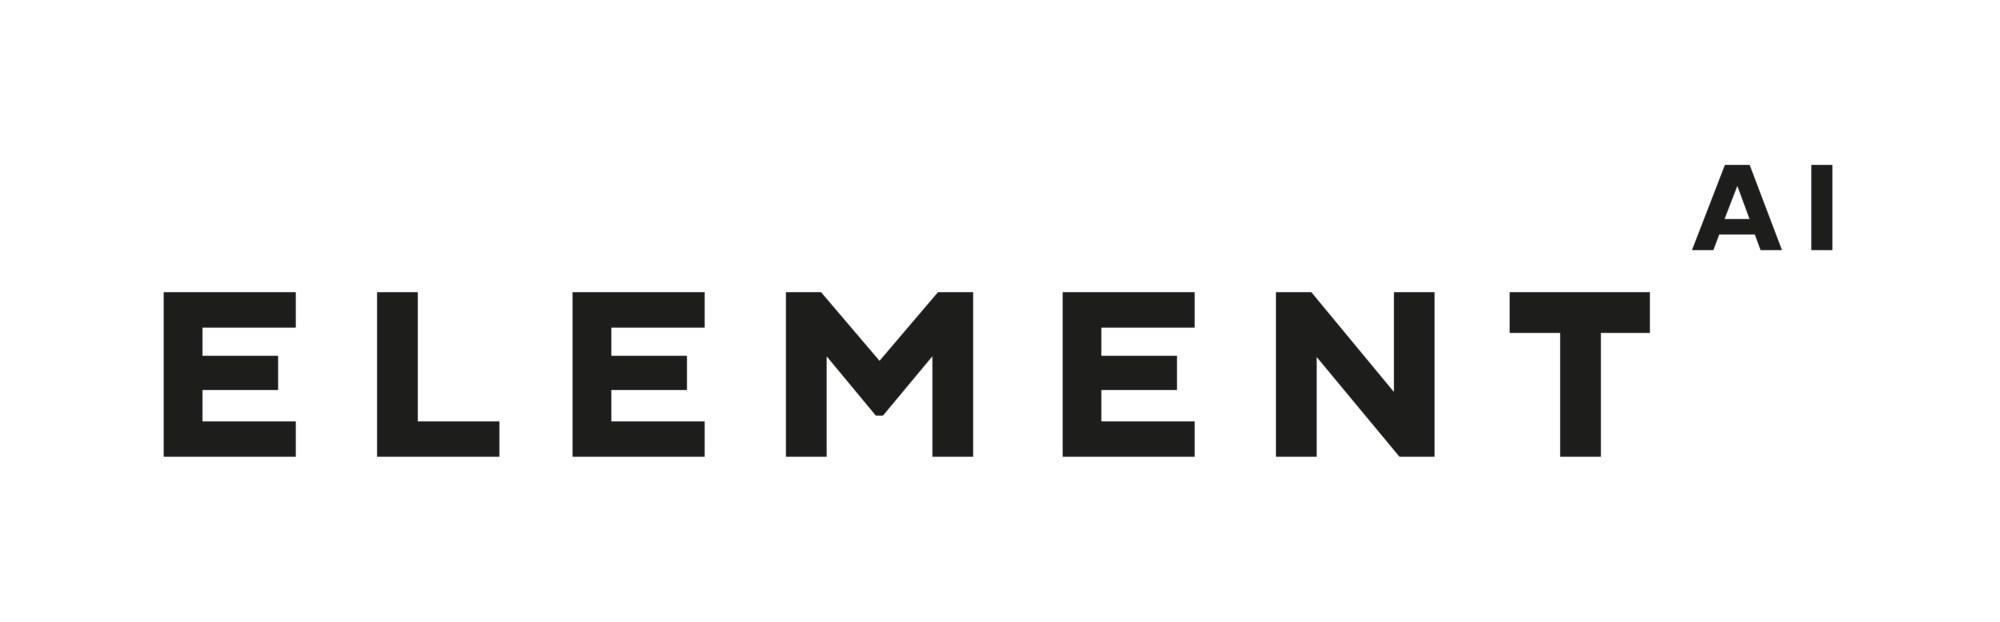 element-ai.jpg